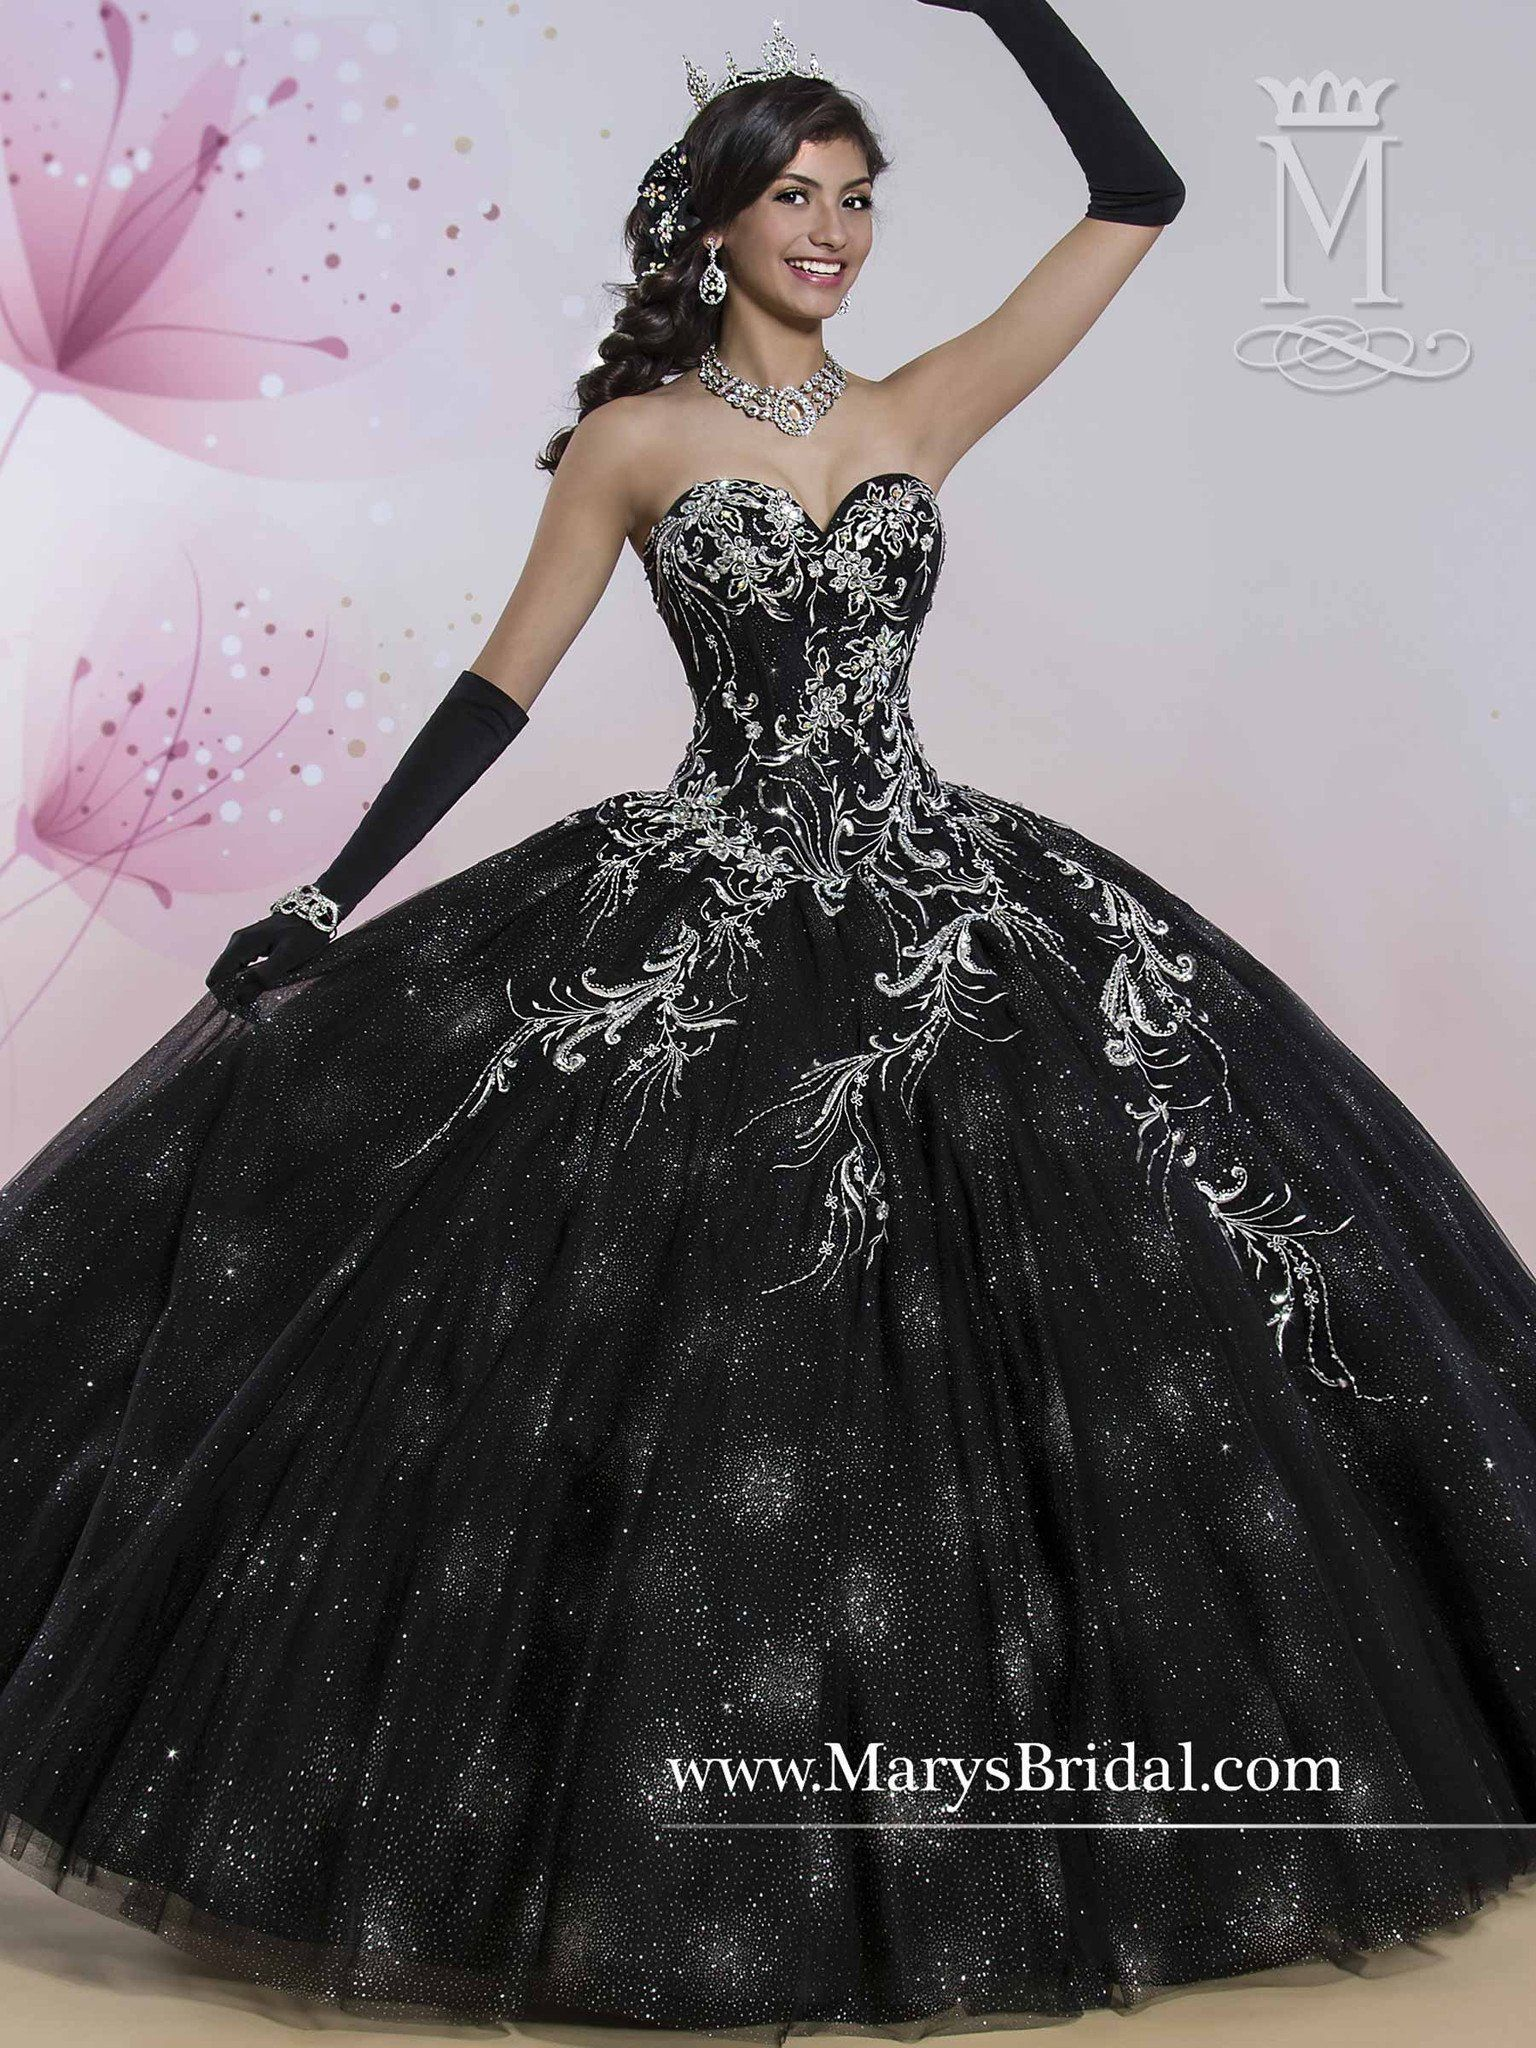 Princess Collection Marys Quinceanera Quincedresses Com Quincelebrations Elegantboutique Quinc Black Quinceanera Dresses Quincenera Dresses Quince Dresses [ 2048 x 1536 Pixel ]